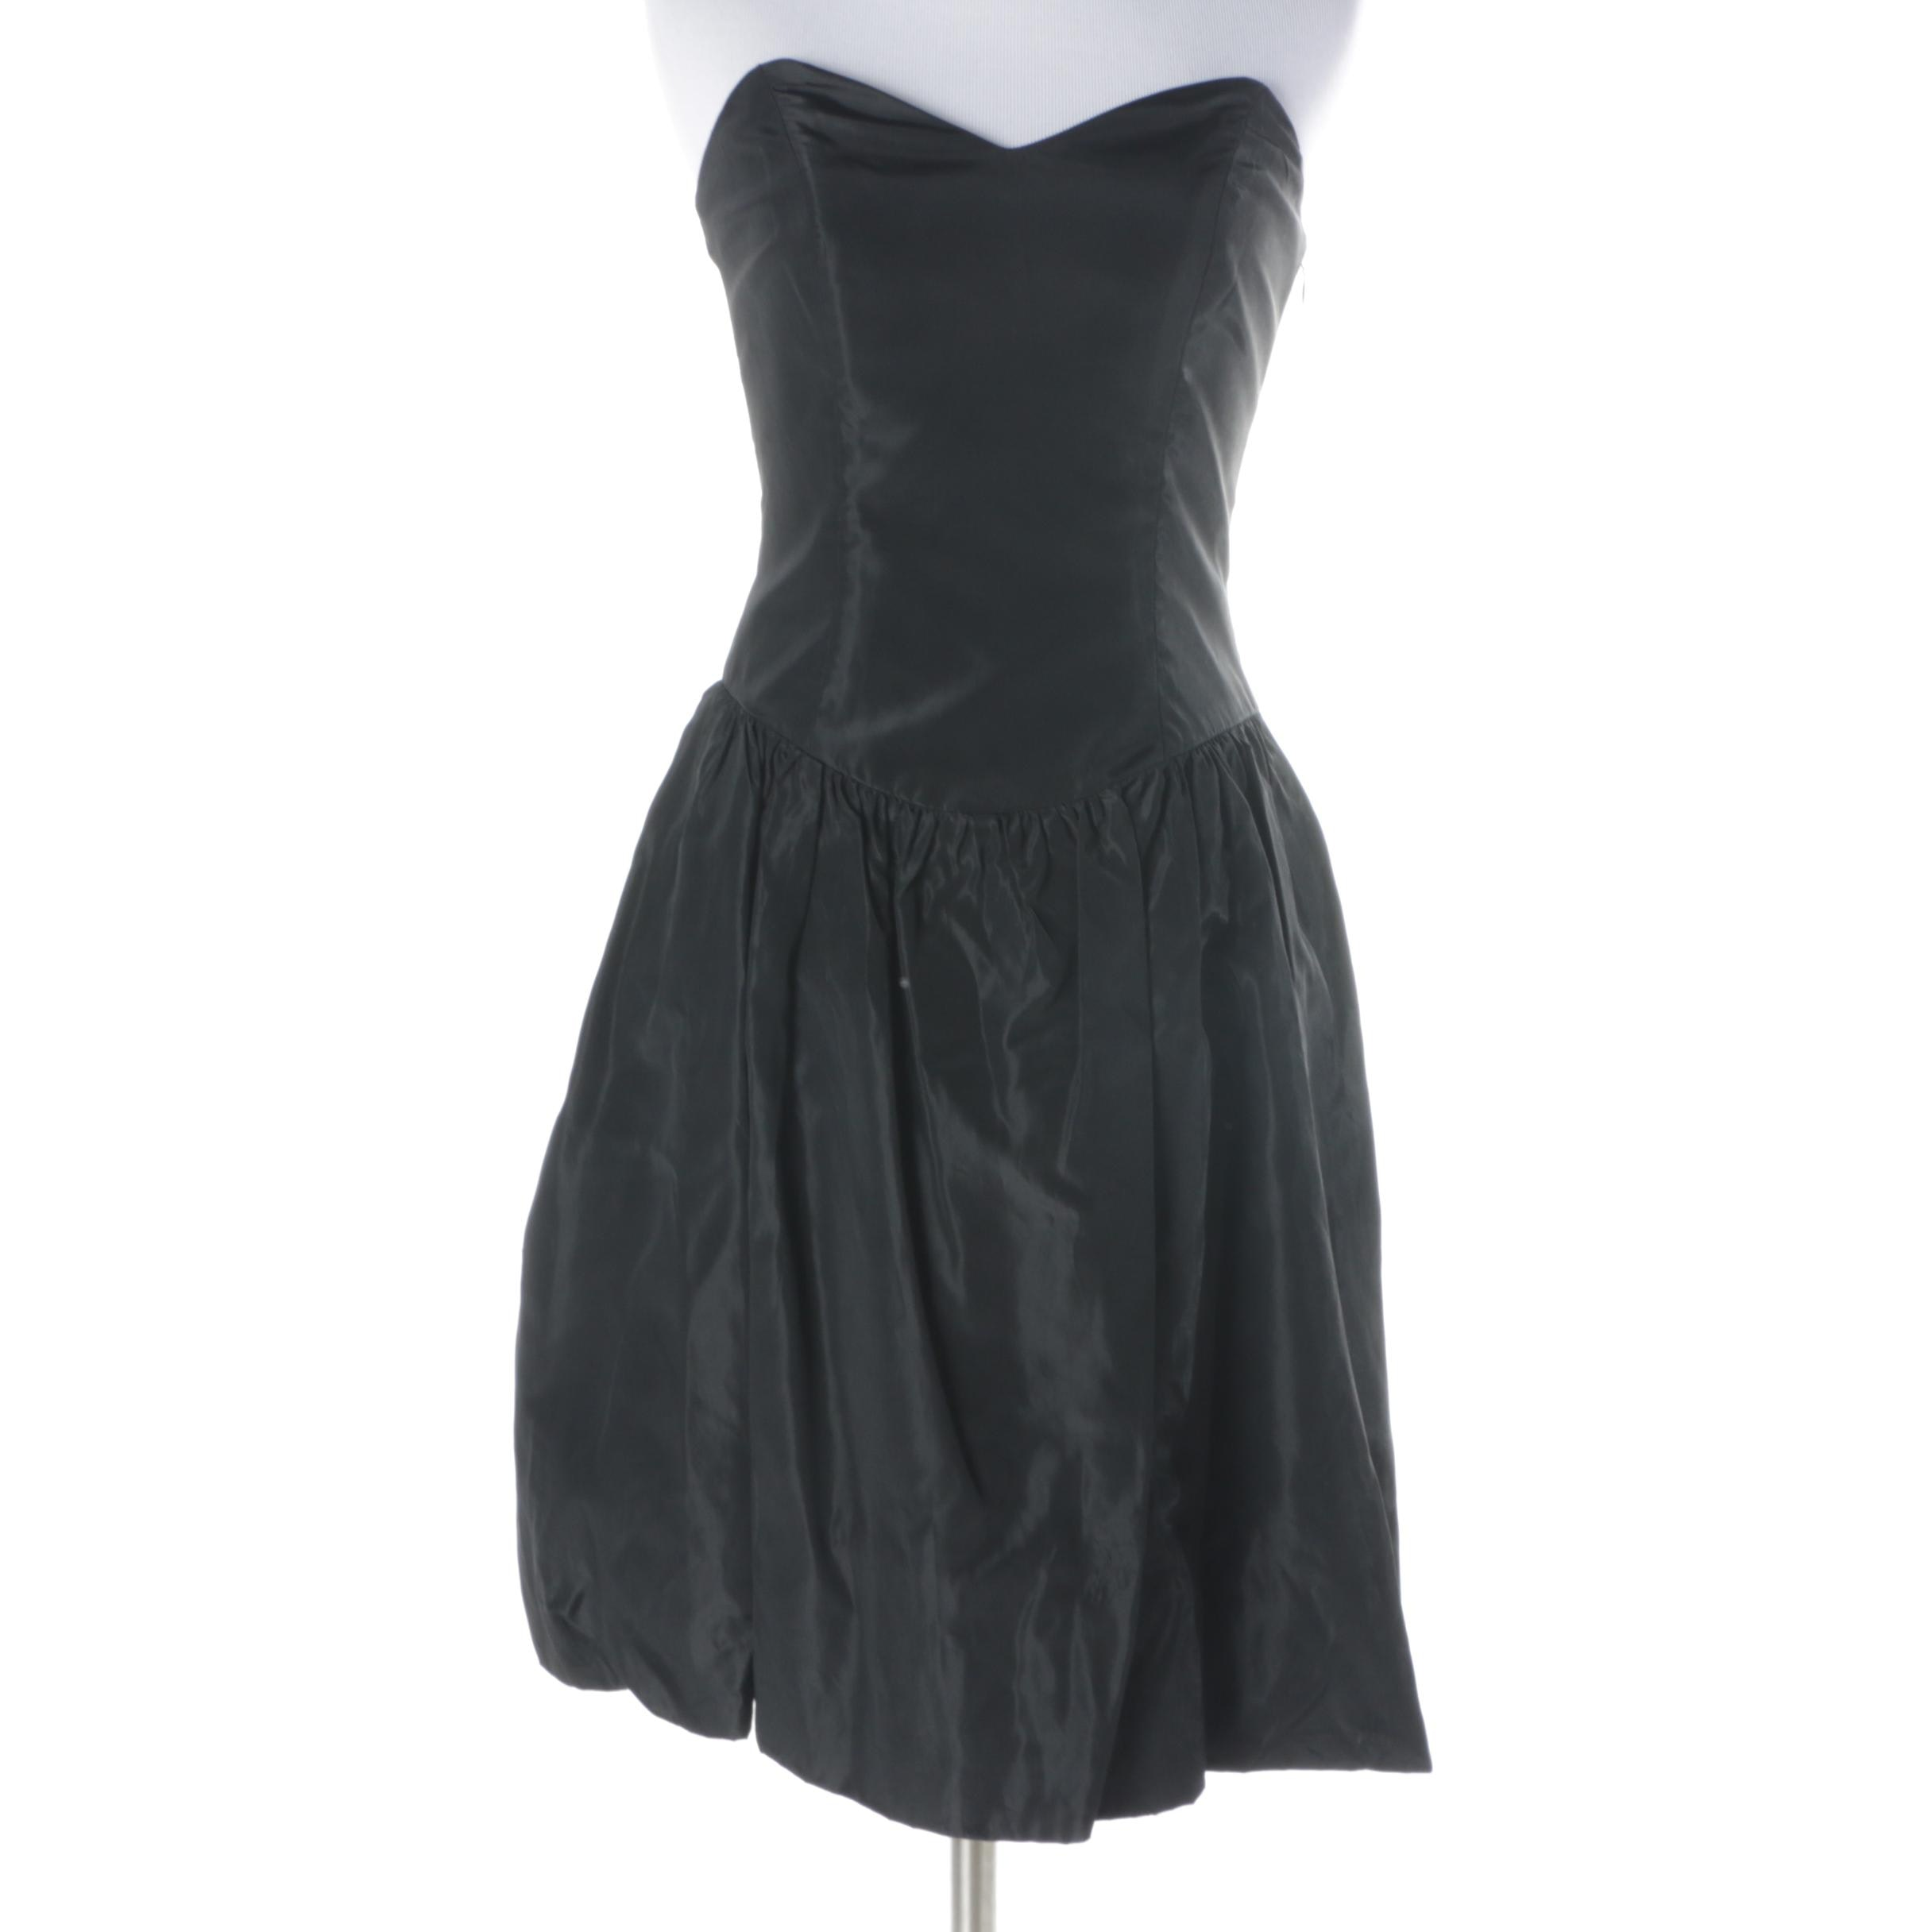 Betsey Johnson Black Strapless Party Dress